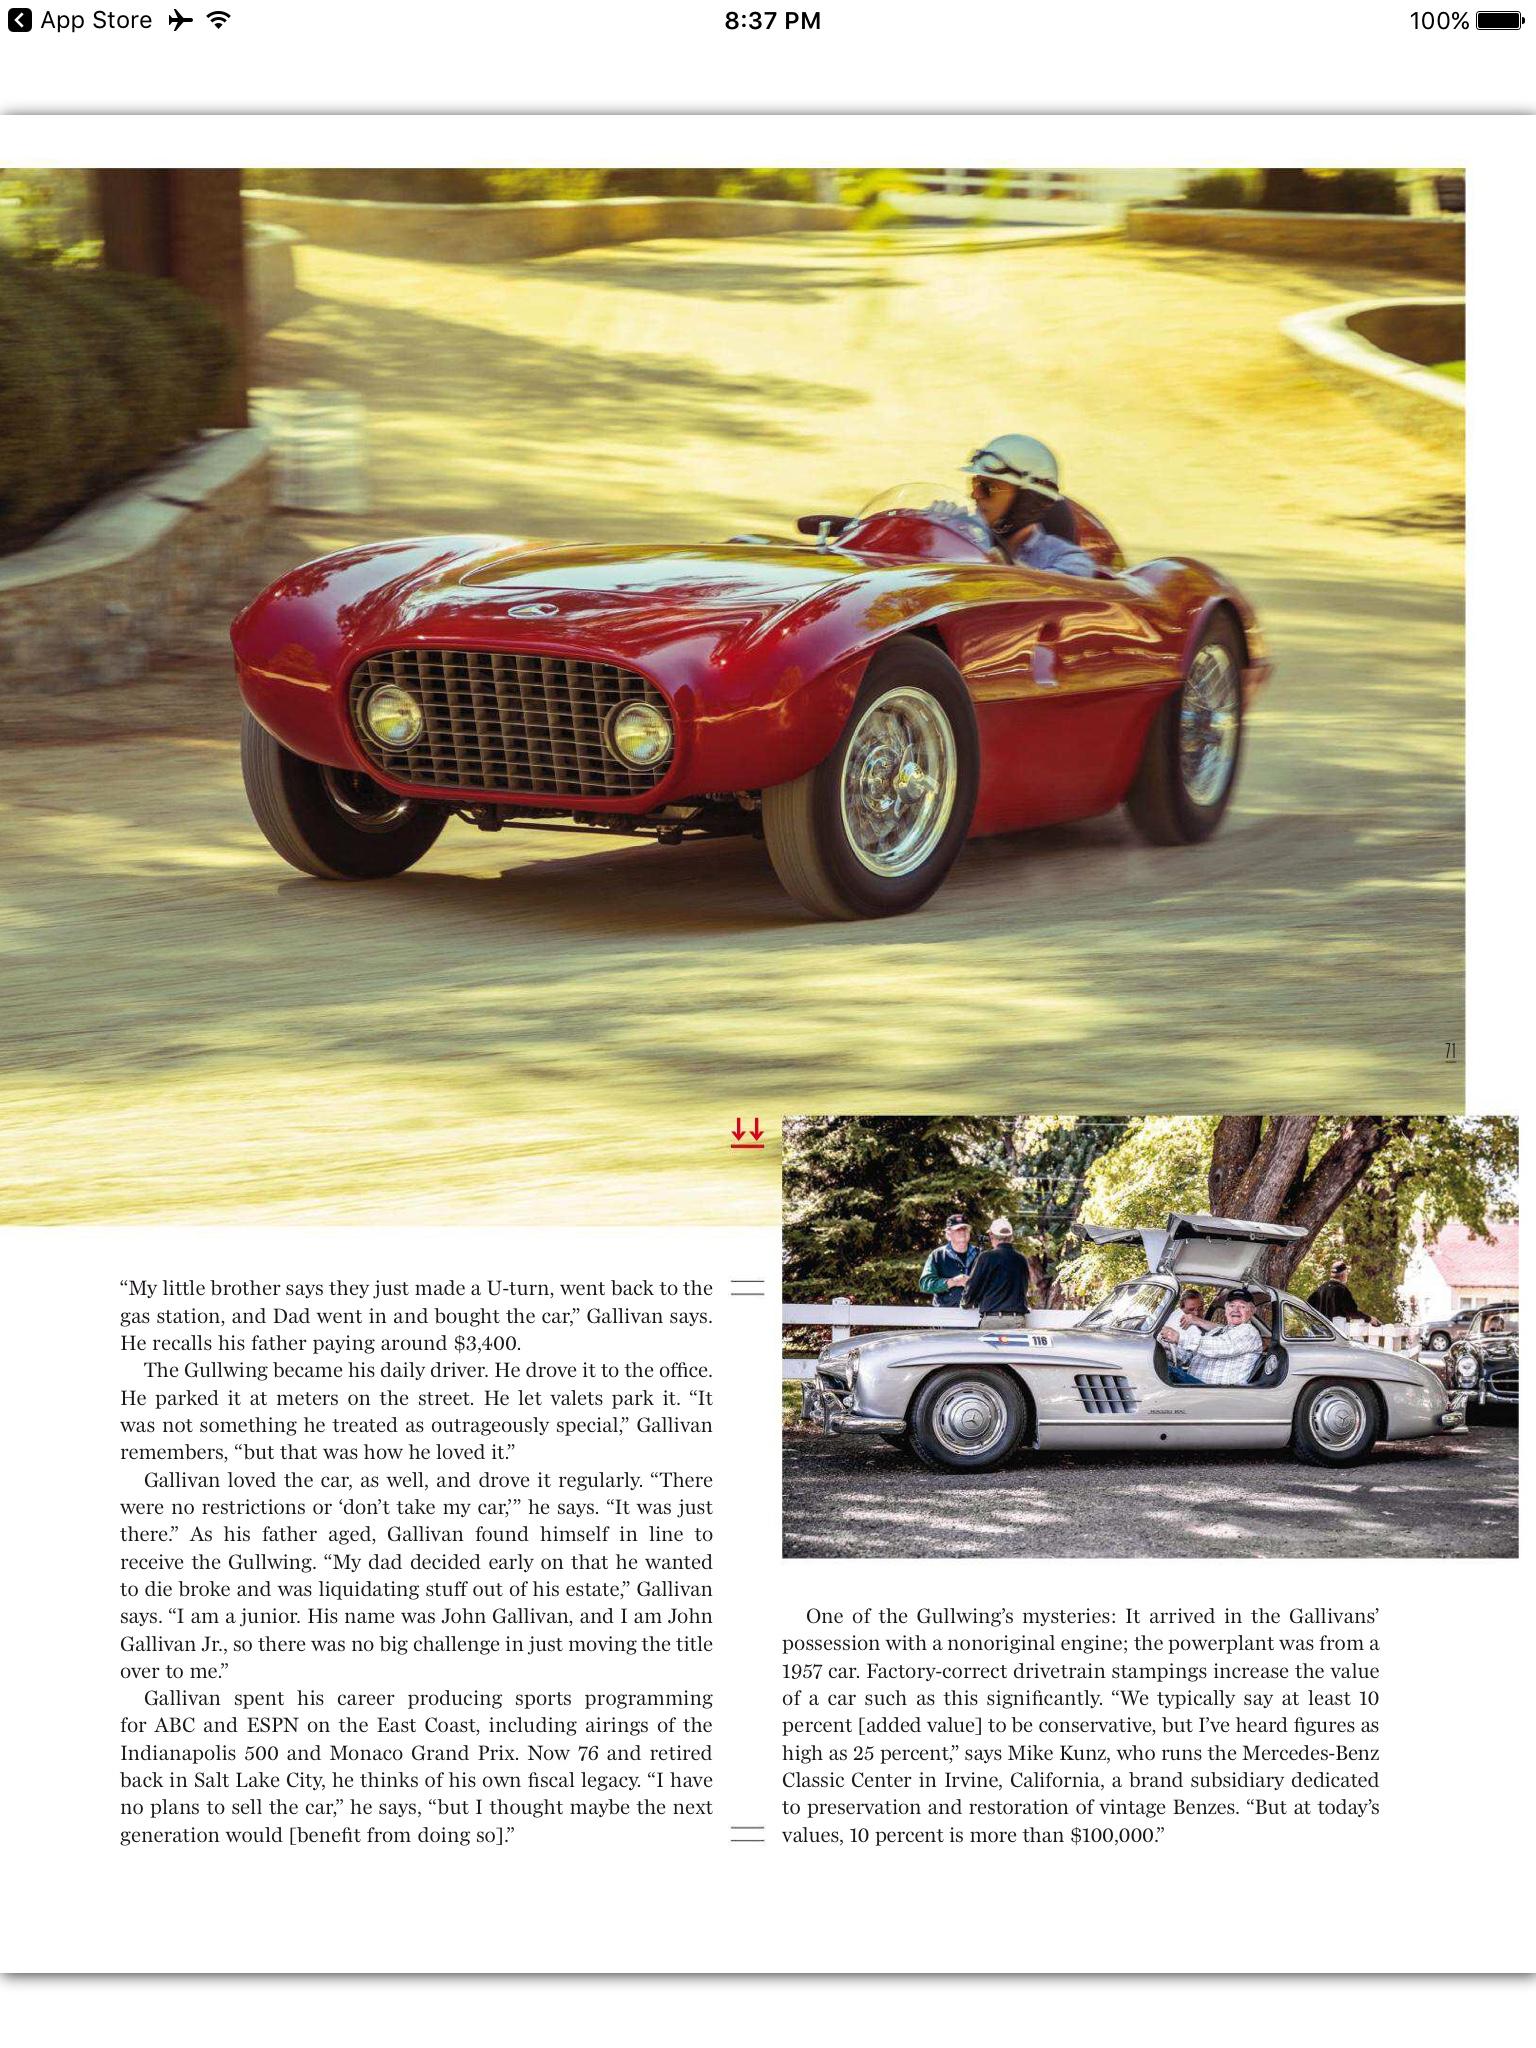 My First Story for Automobile – Brett Berk